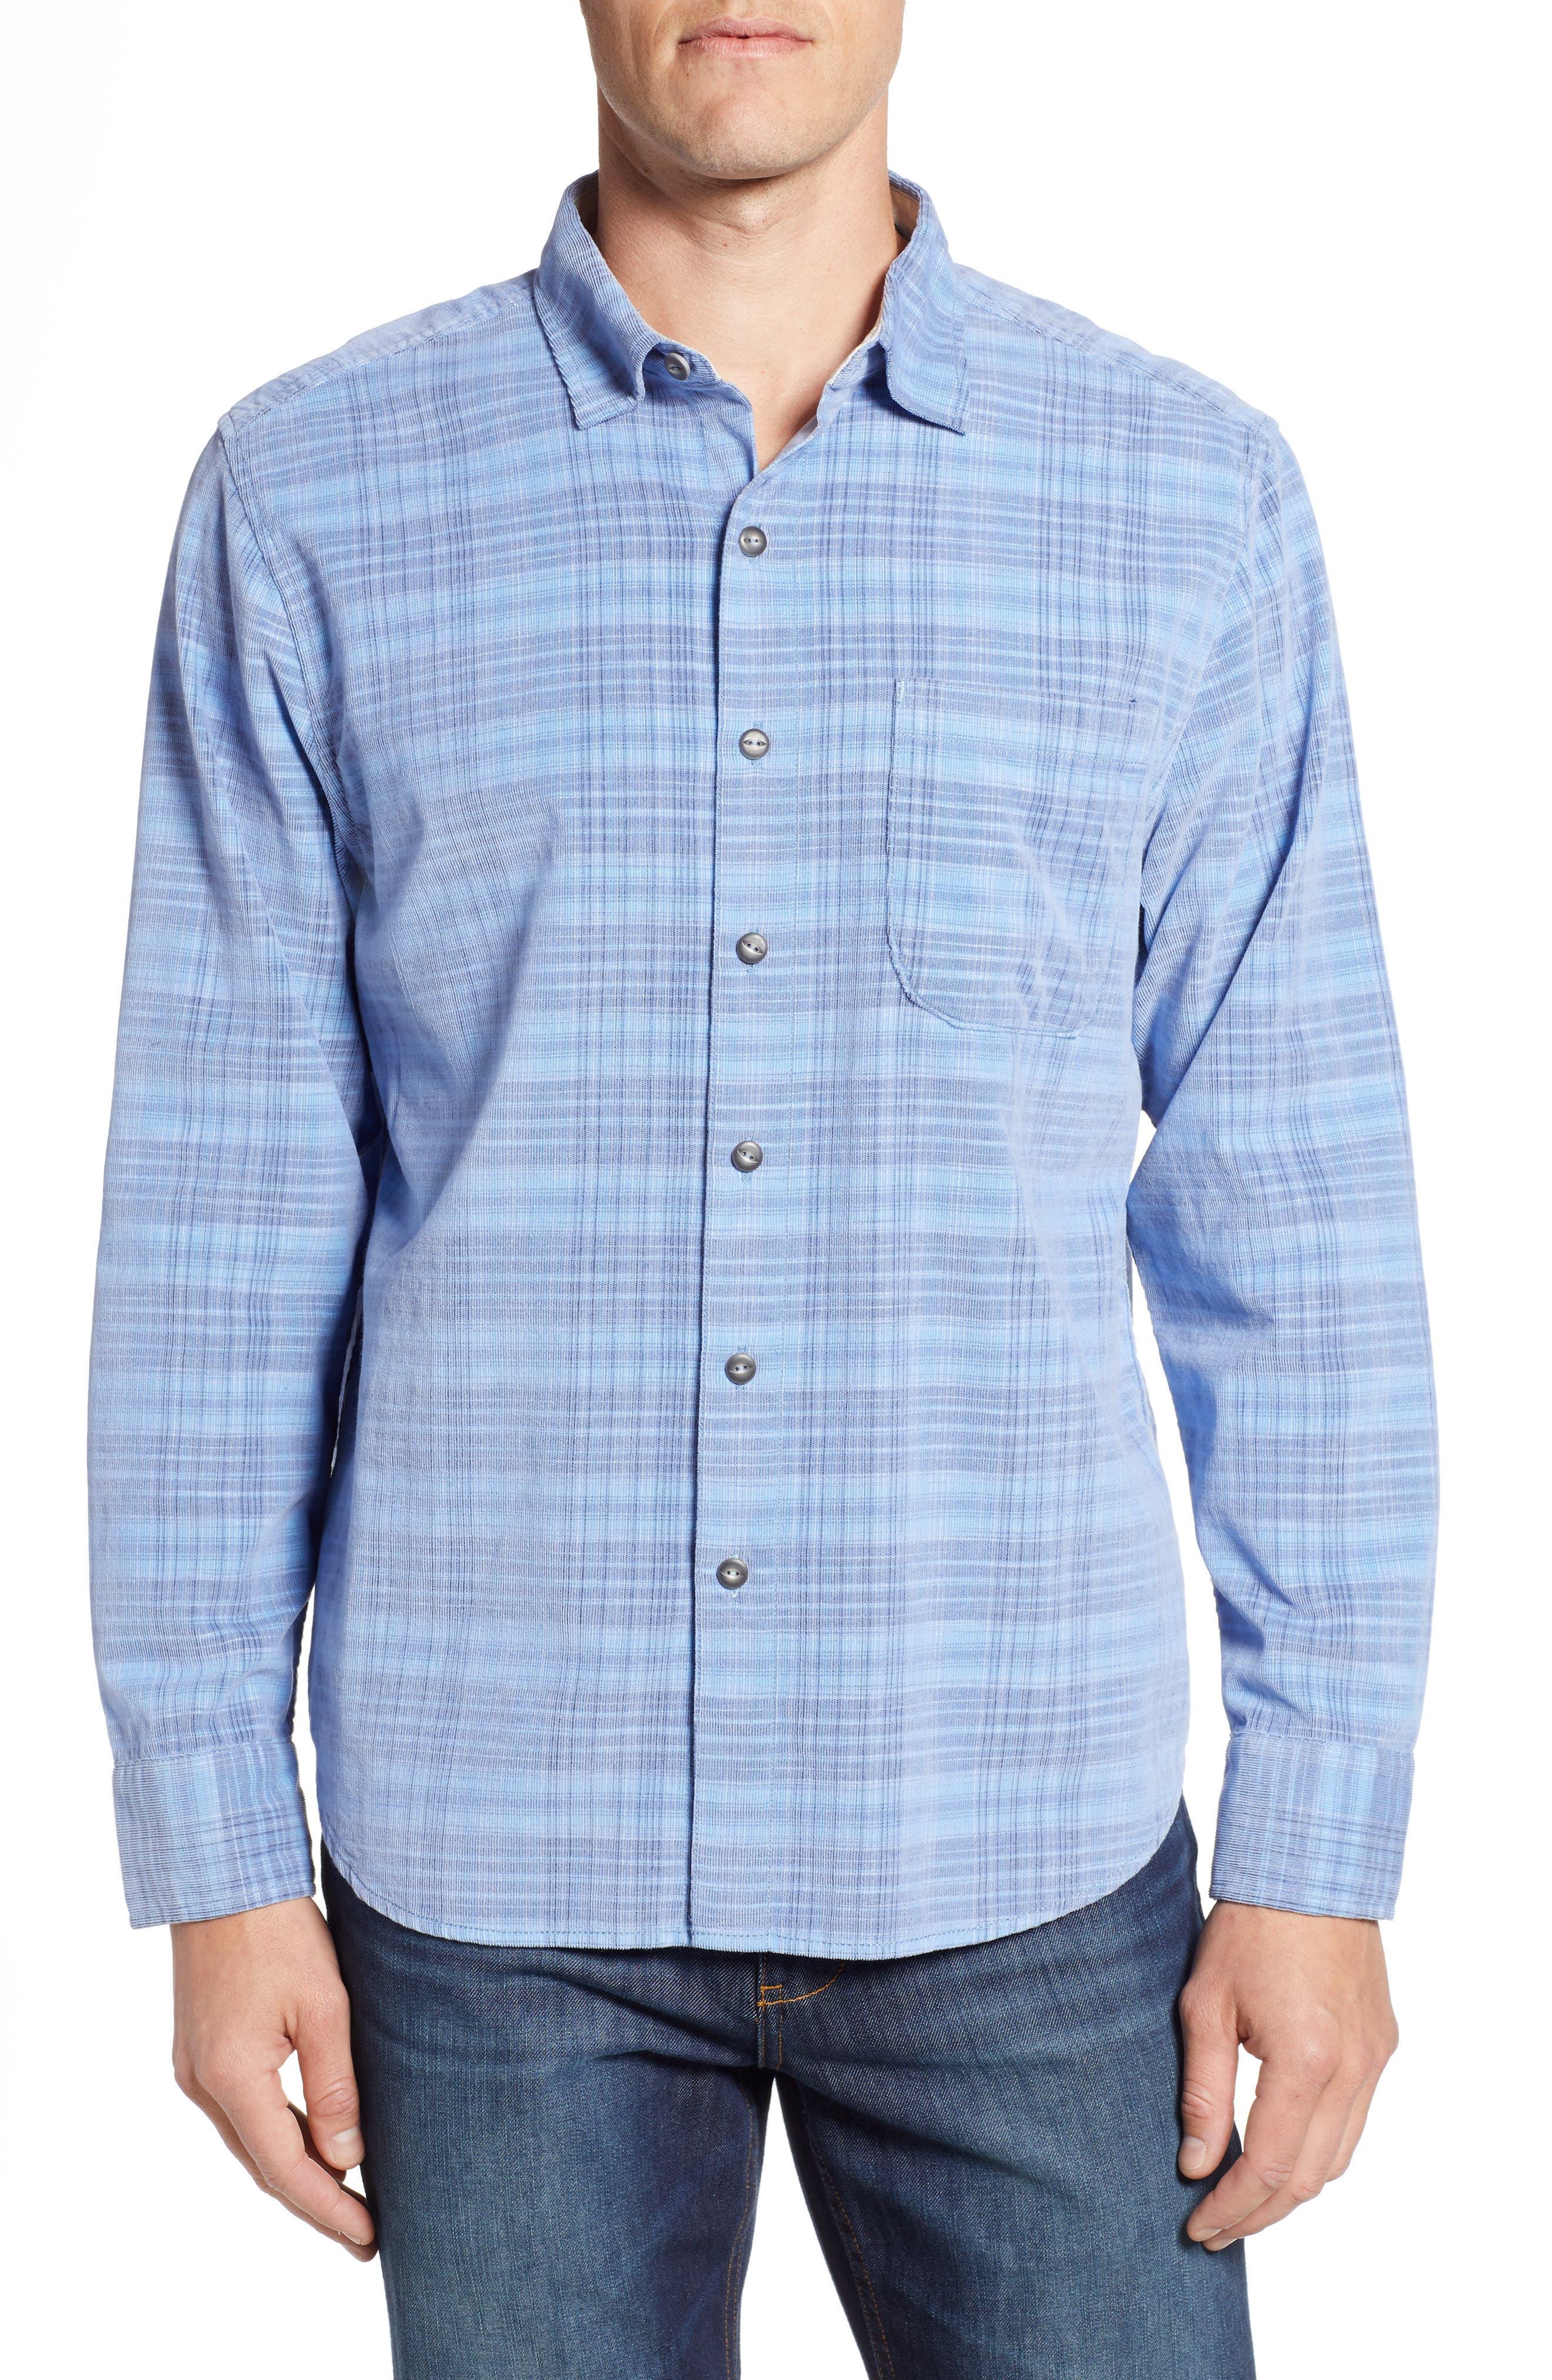 Cruzy Corduroy Shirt,                             Main thumbnail 1, color,                             RIVIERA AZURE